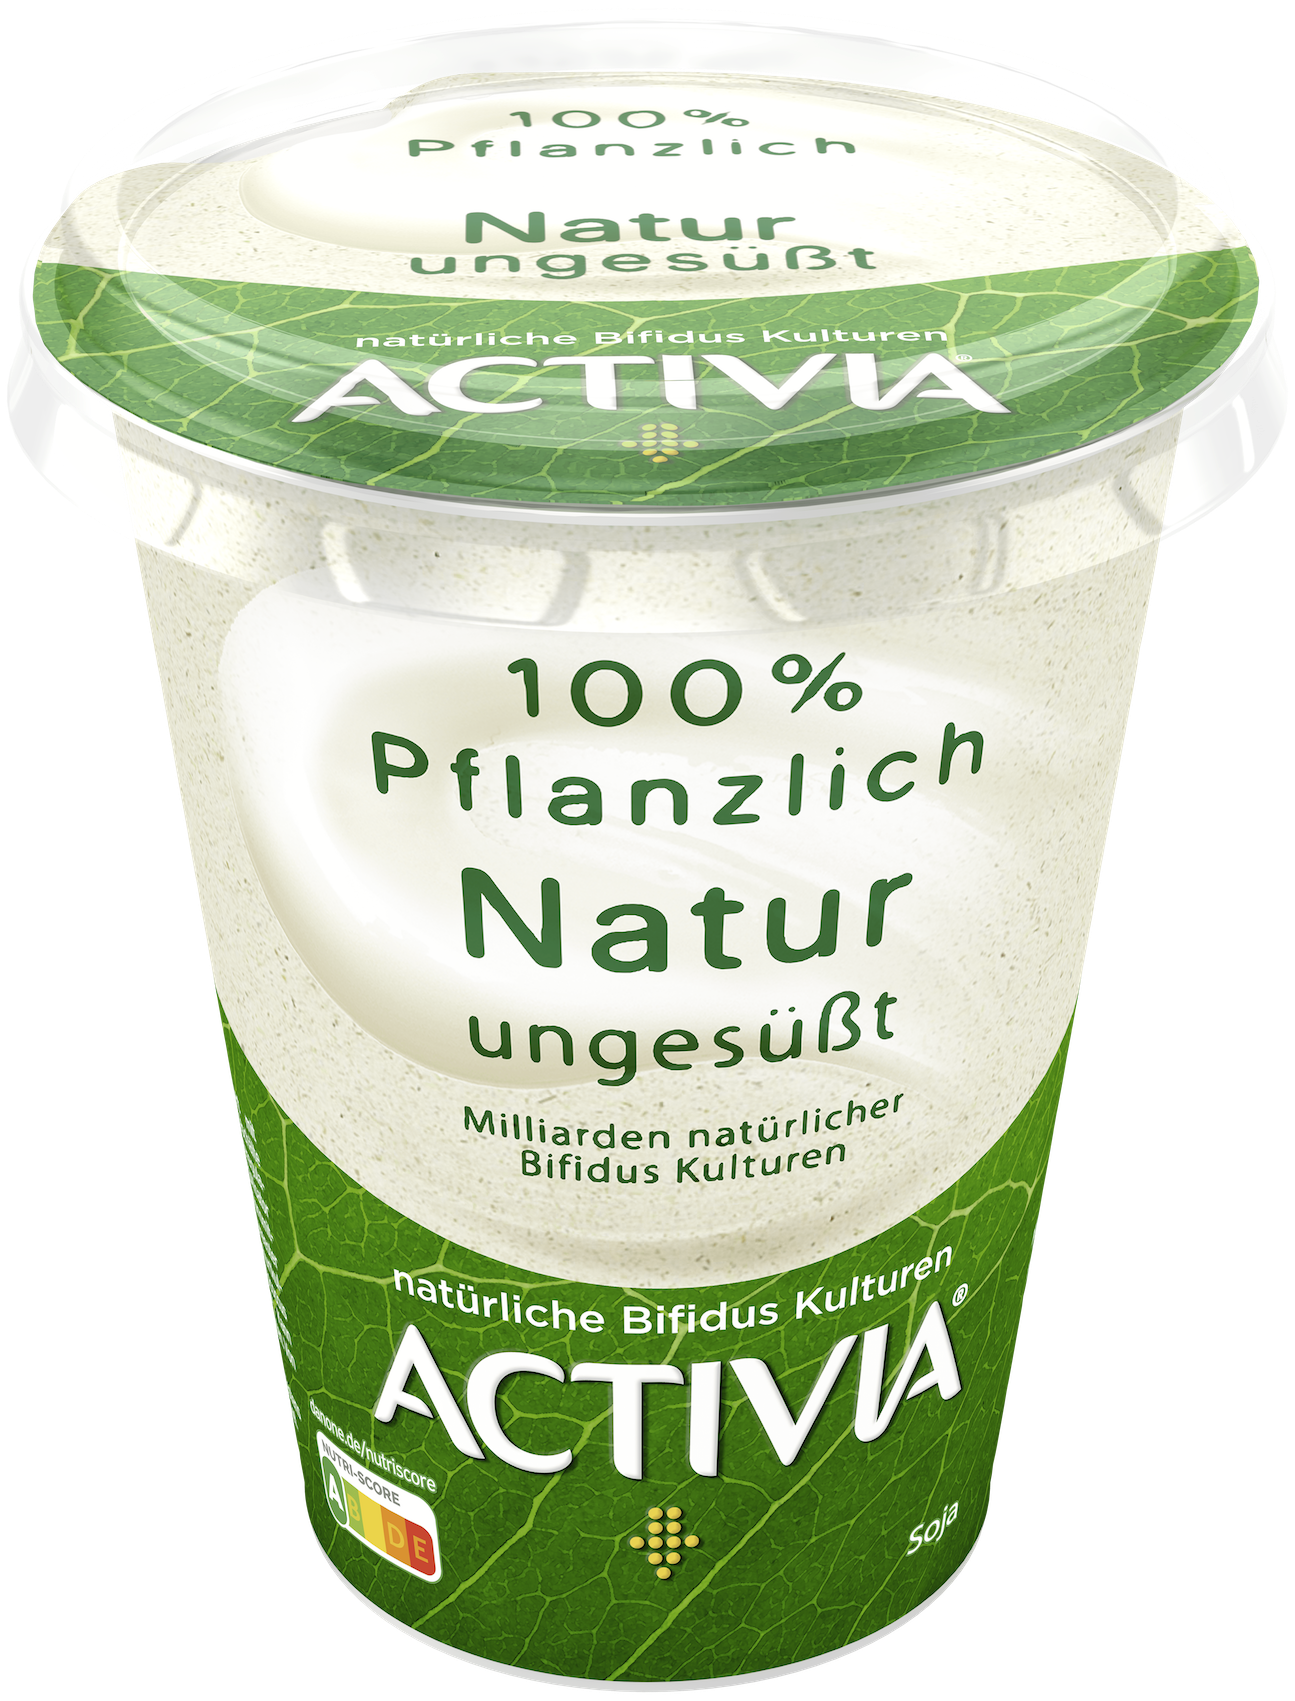 Activia 100 Pflanzlich